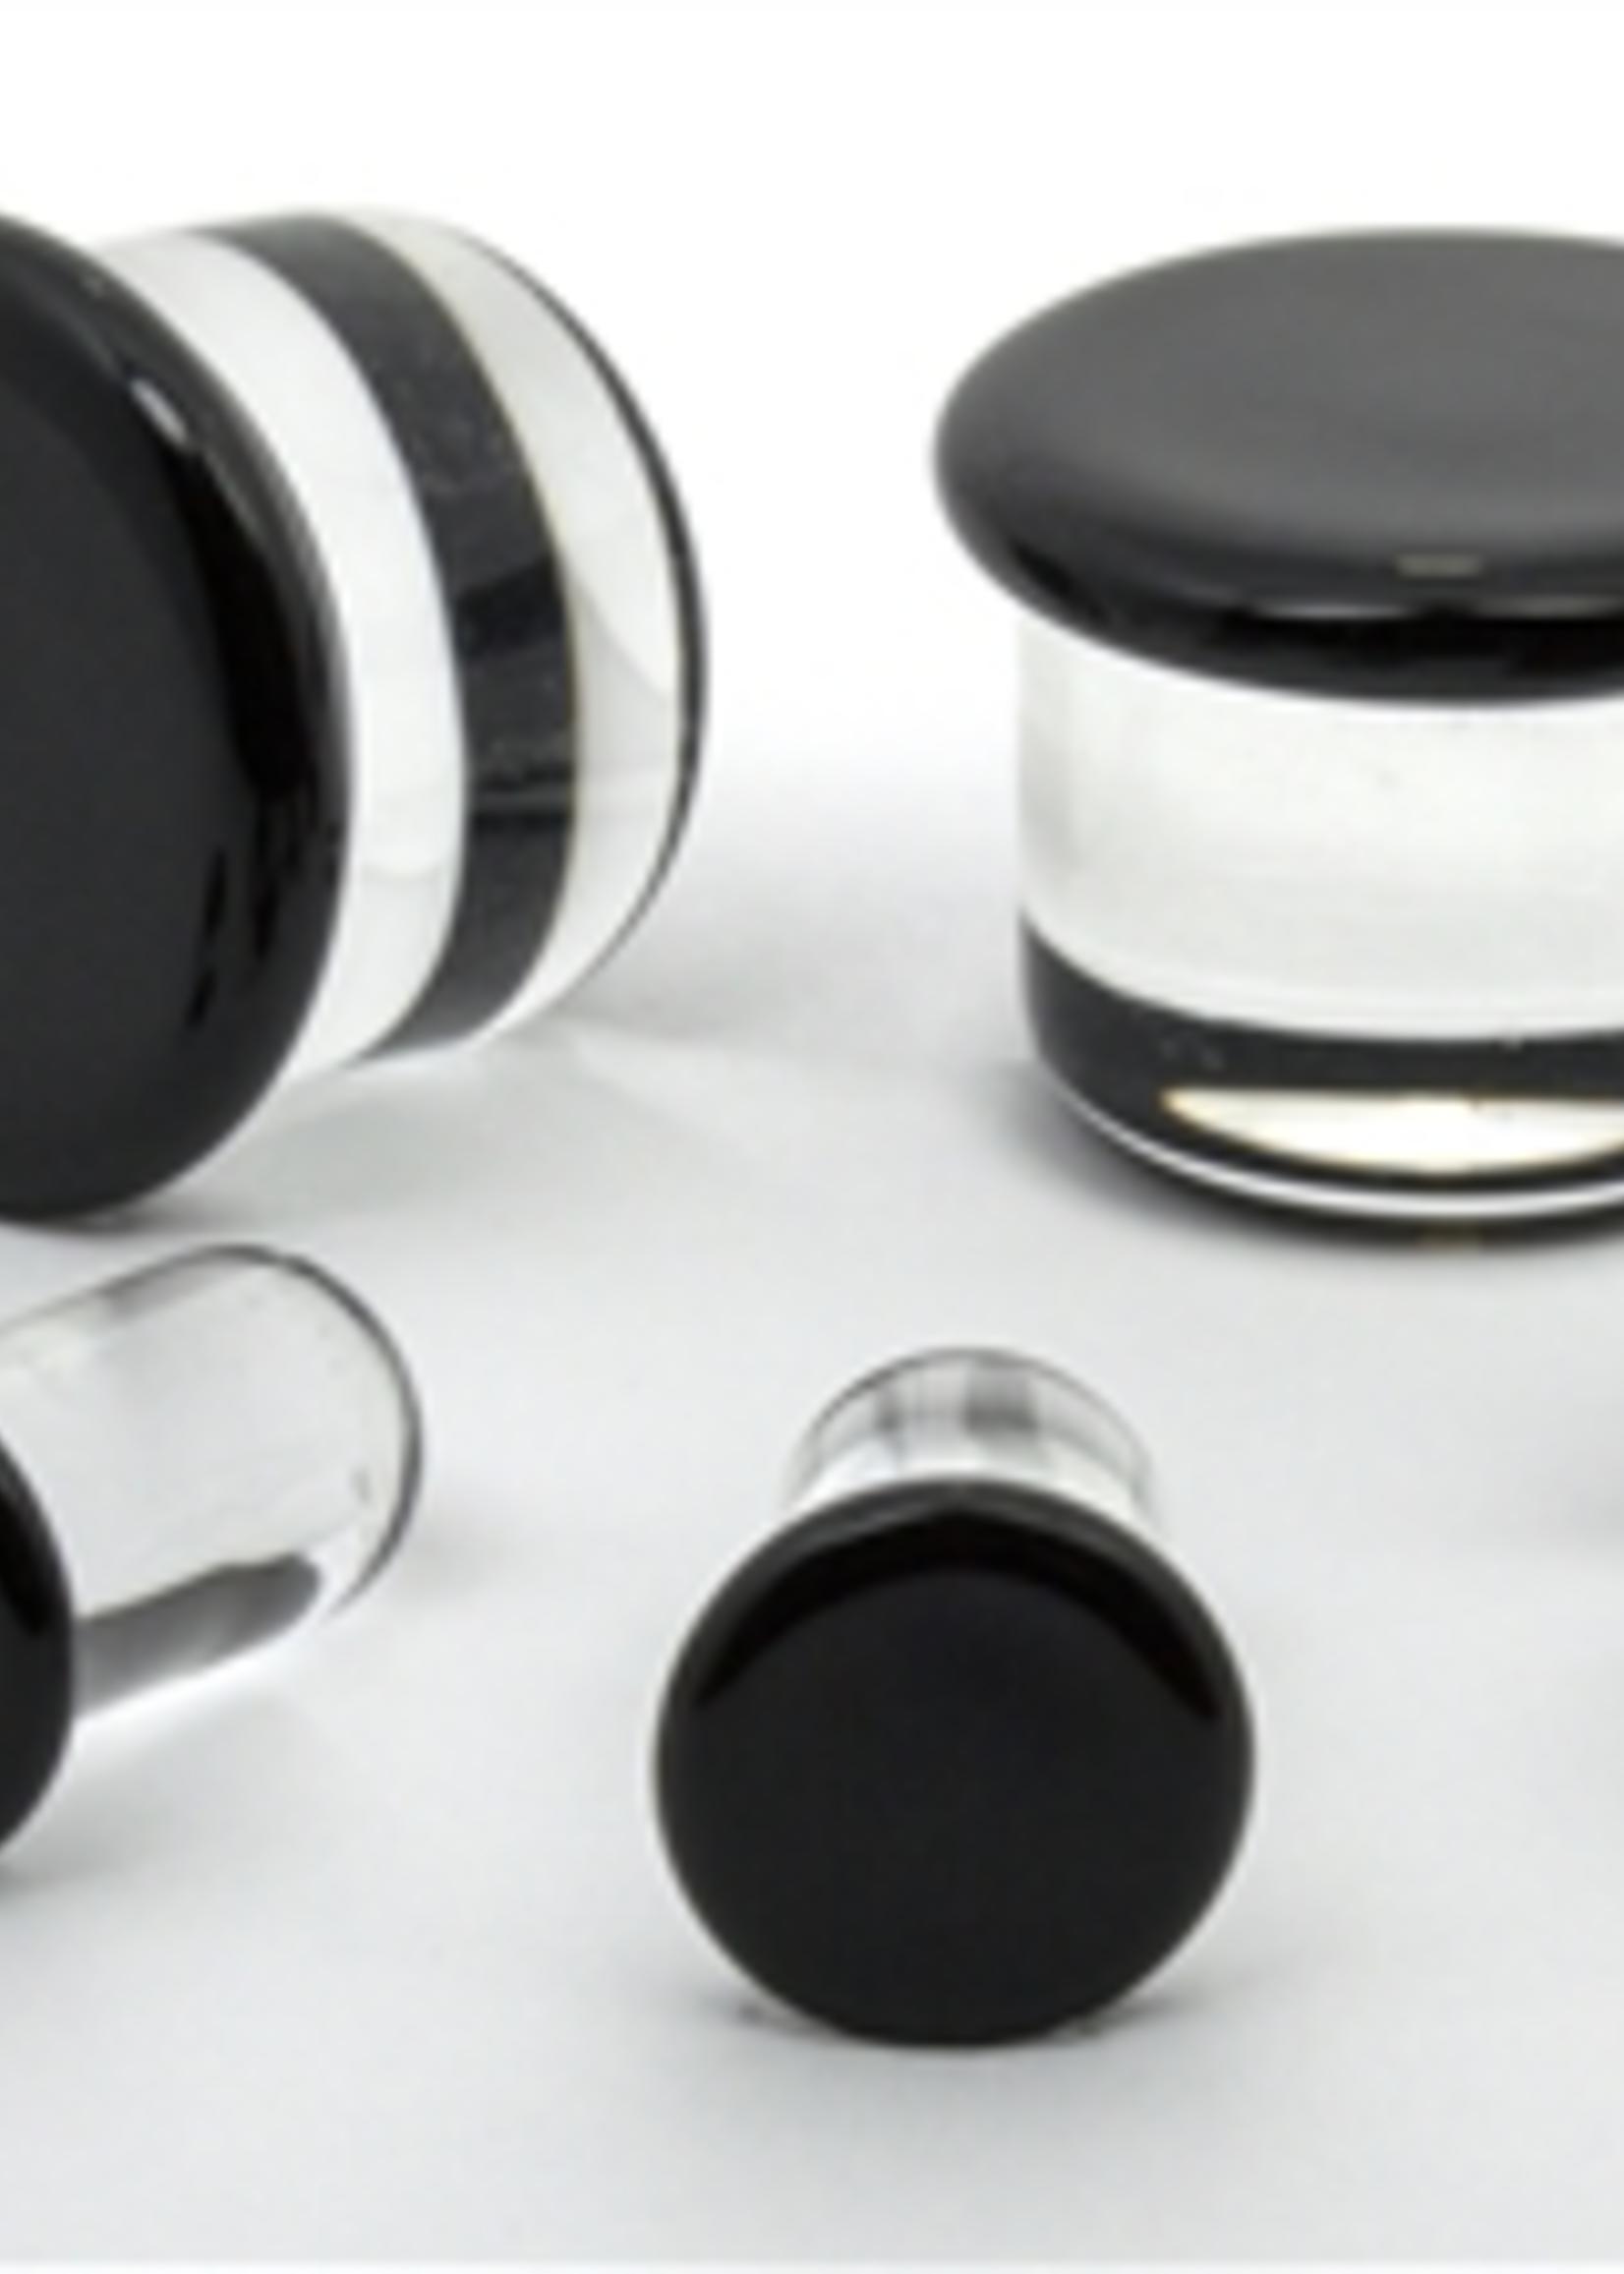 21mm SF Glass Plugs